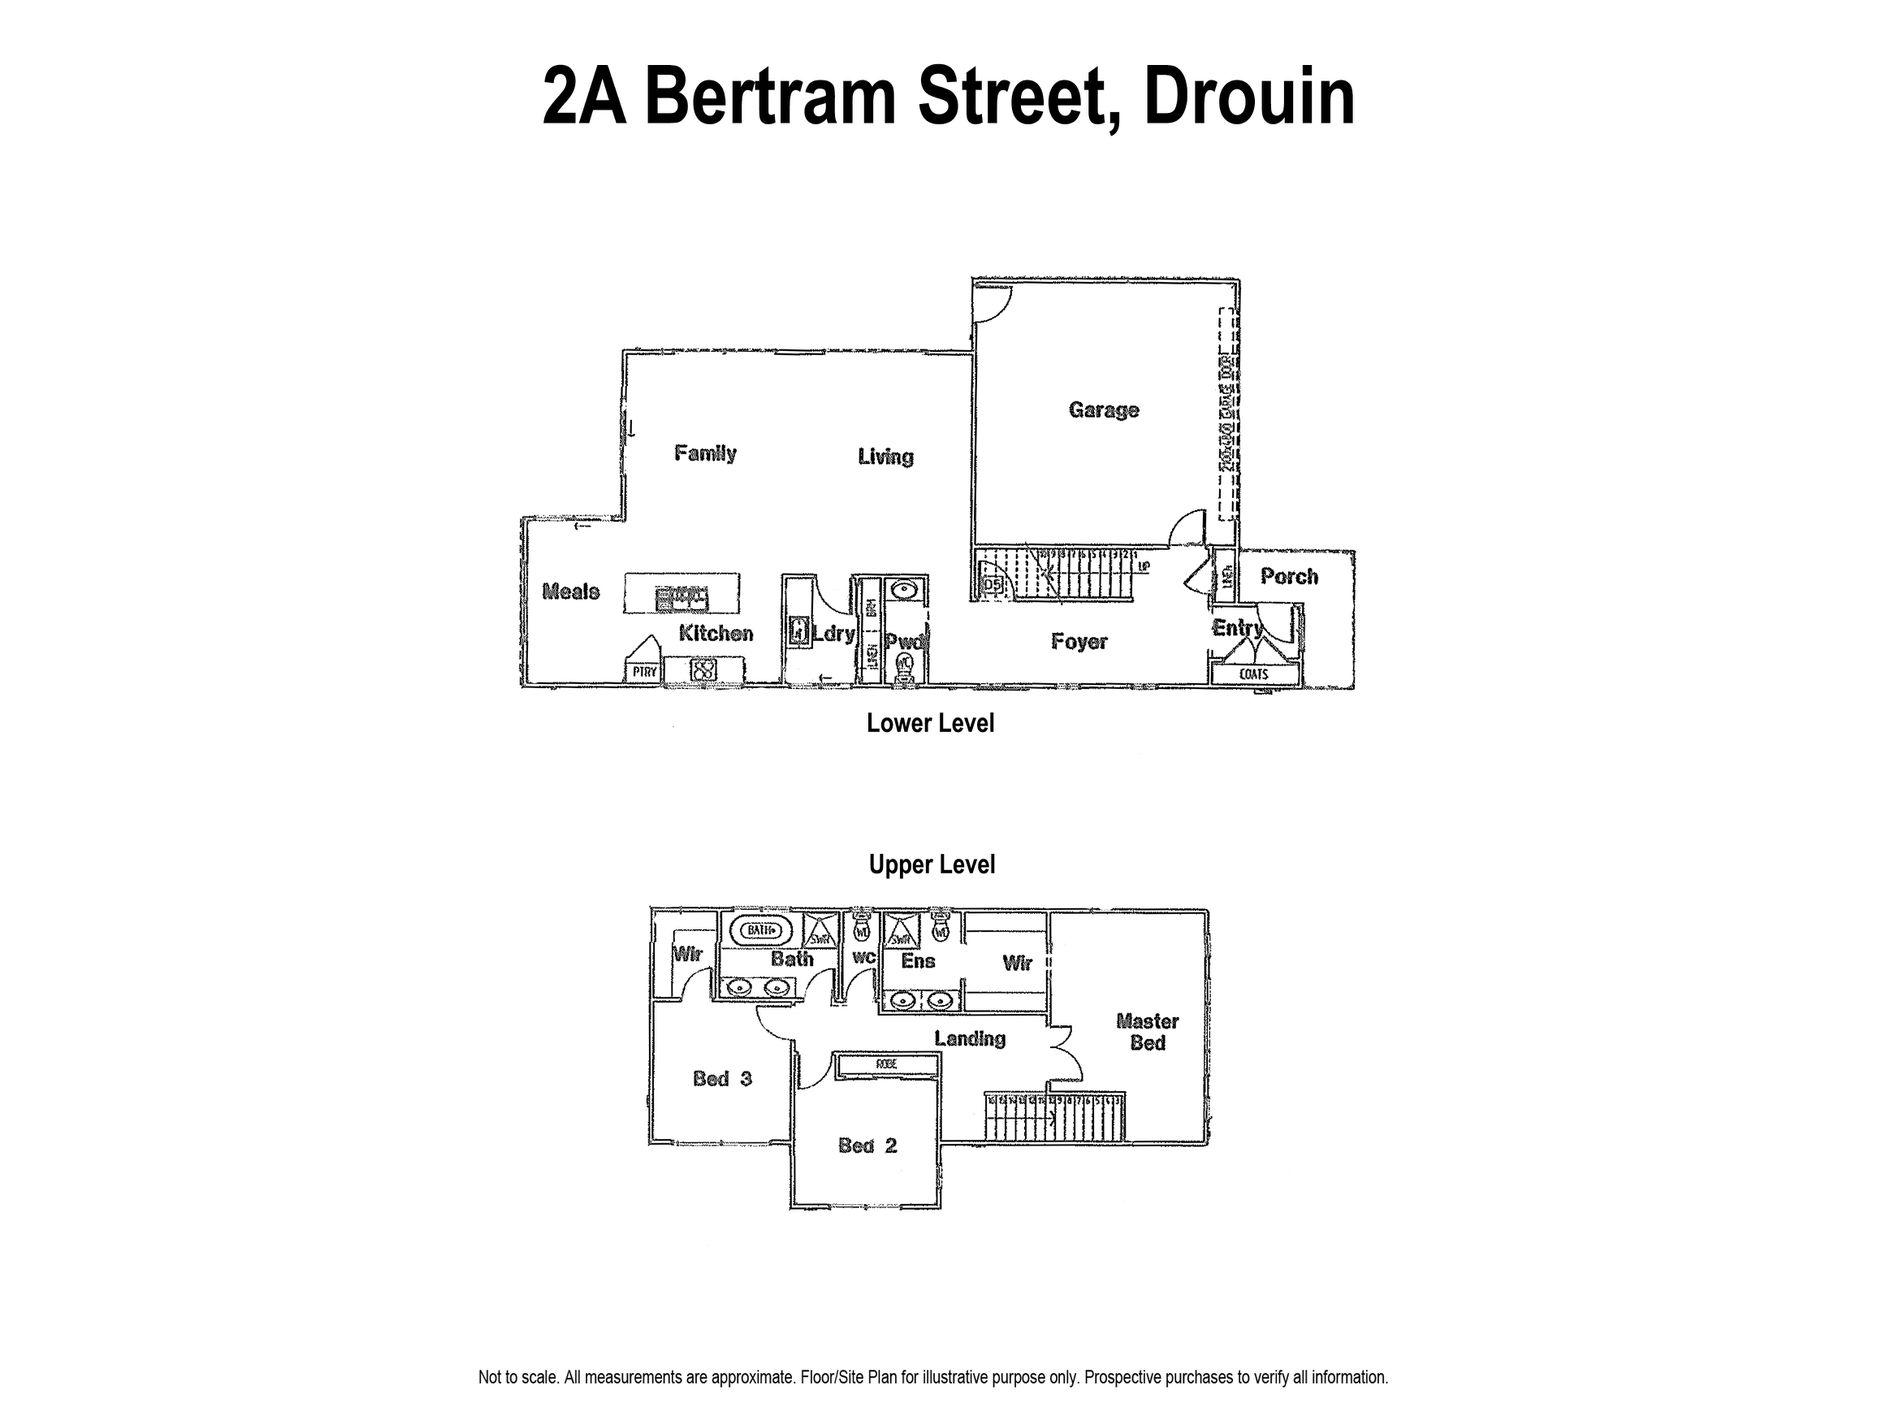 2 Bertram Street, Drouin